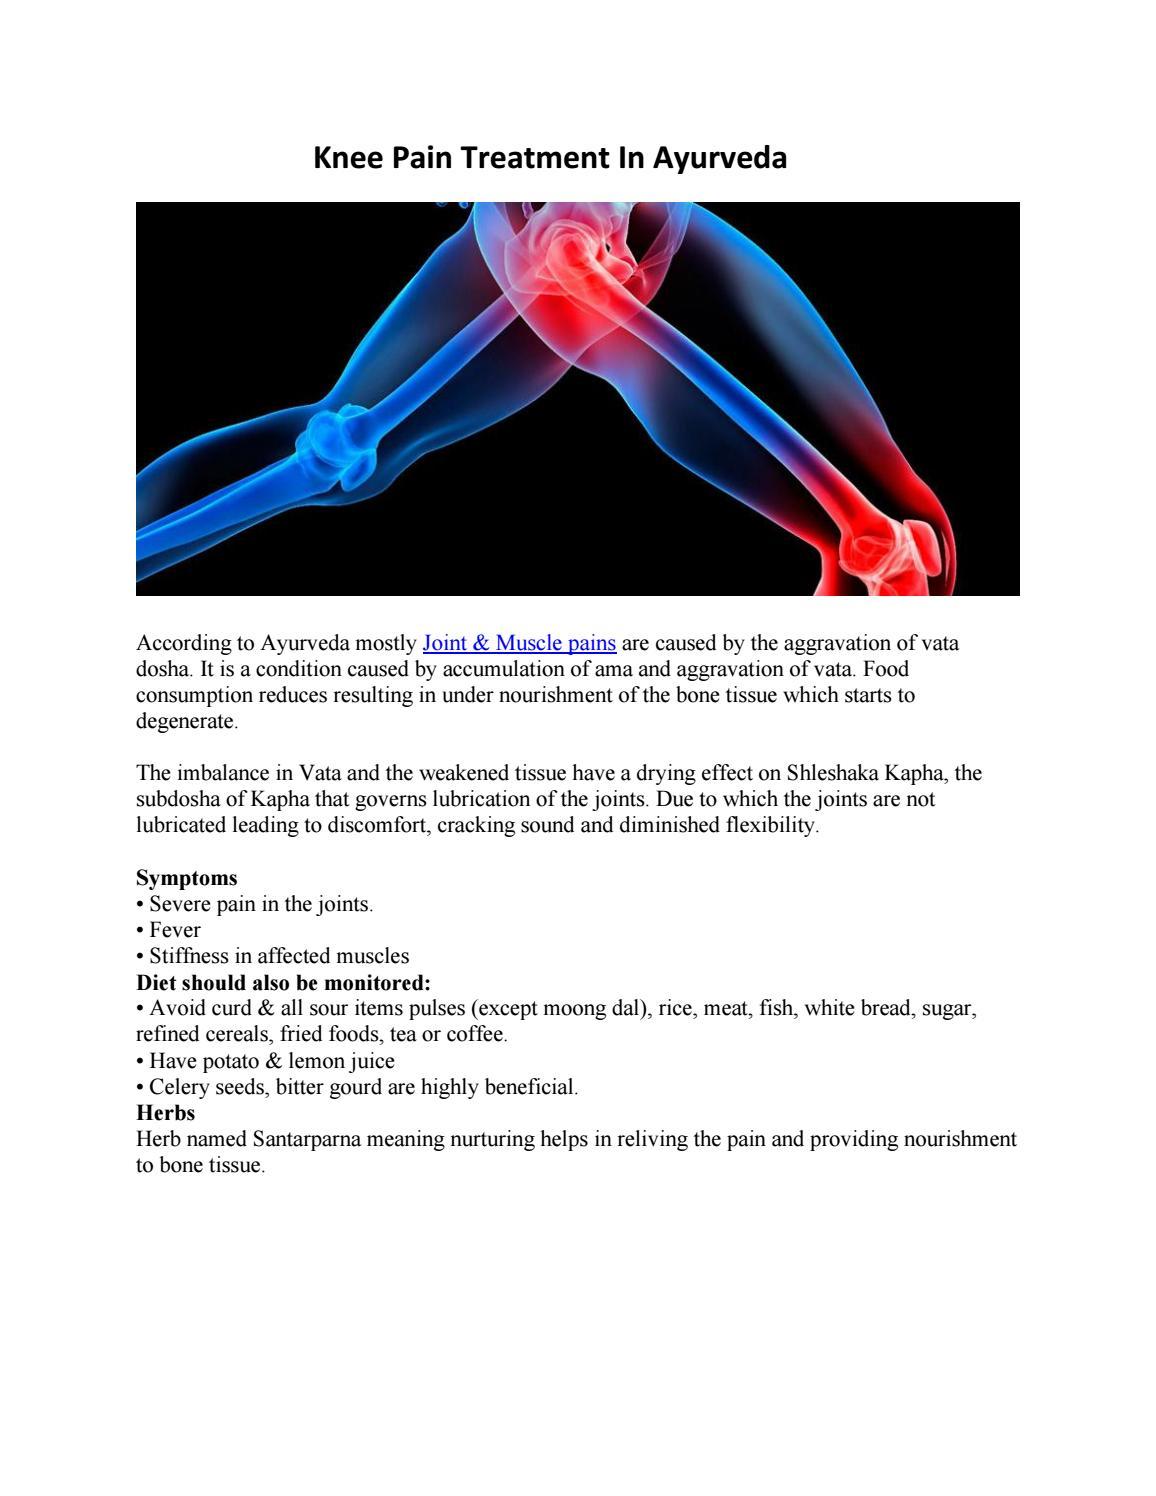 Knee pain treatment in ayurveda by Best Ayurvedichospital in